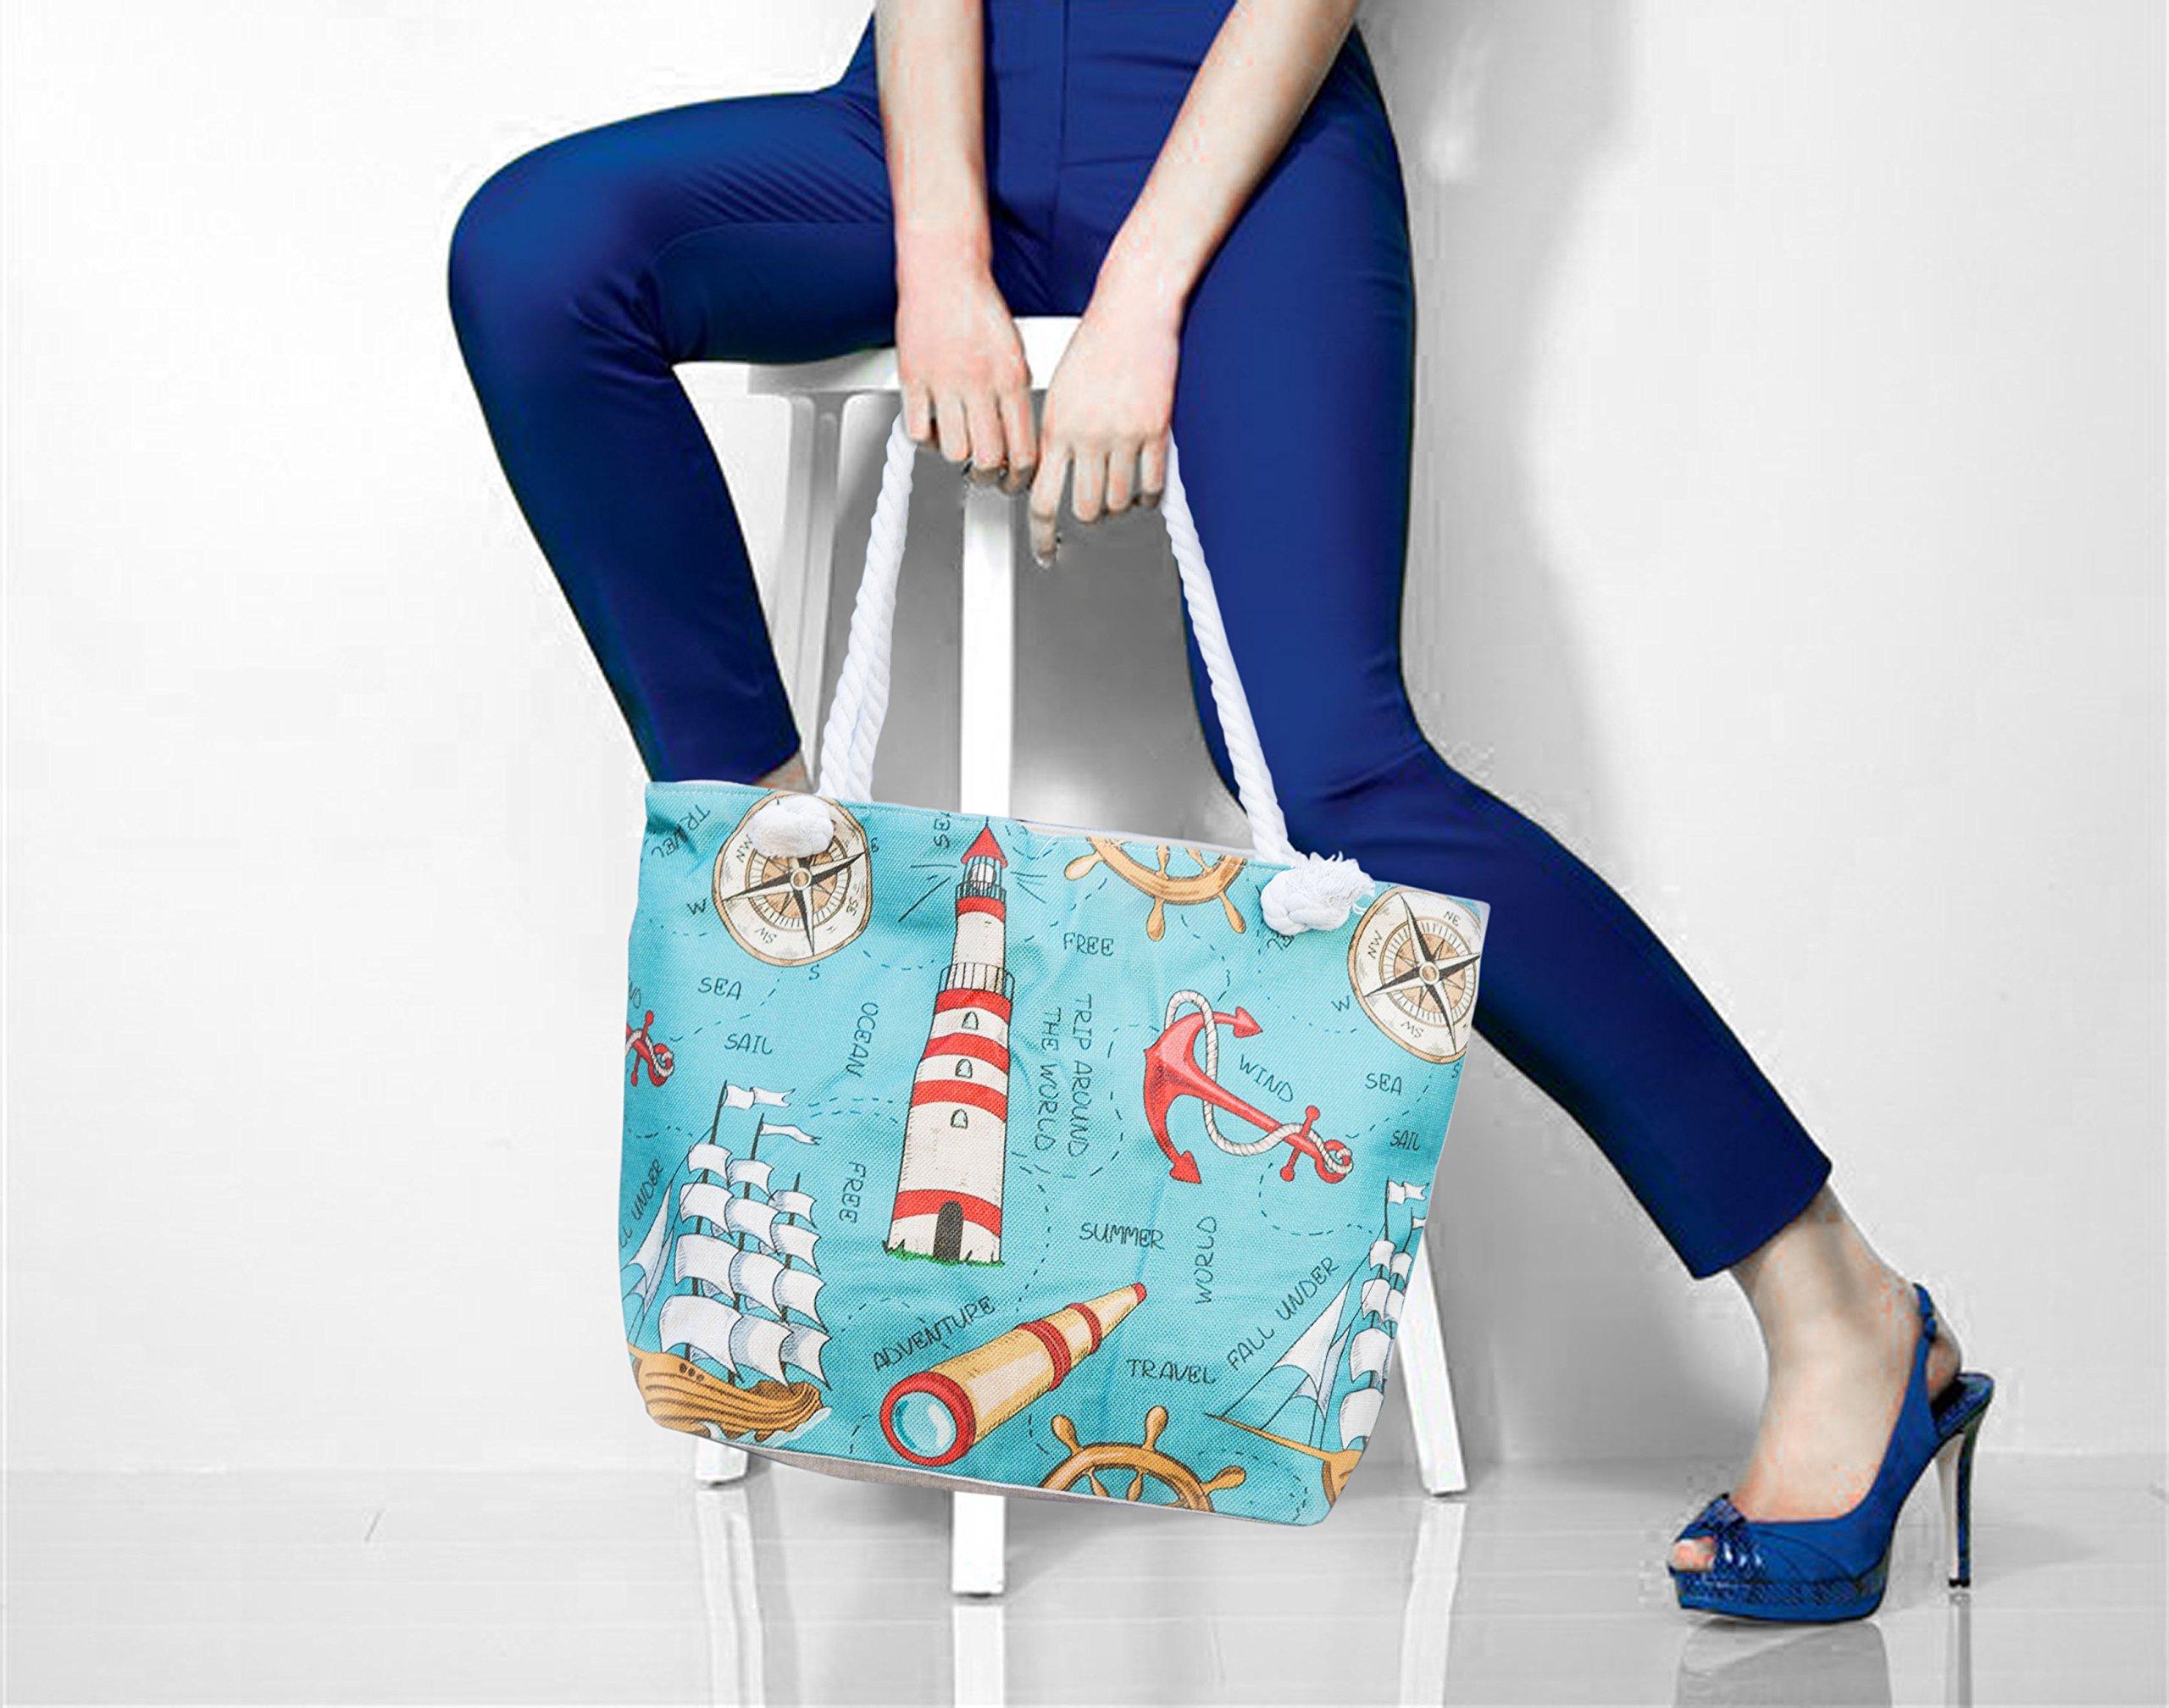 JJMG NEW Summer Beach Bag Stroller Friendly Women's Large Capacity Mom's Tote Beach Shoulder Bag With Rope Handles –Shopping Bag, Diaper Bag, Yoga Bag, Toys, Towels, Swim Suits, etc. by JJMG (Image #4)